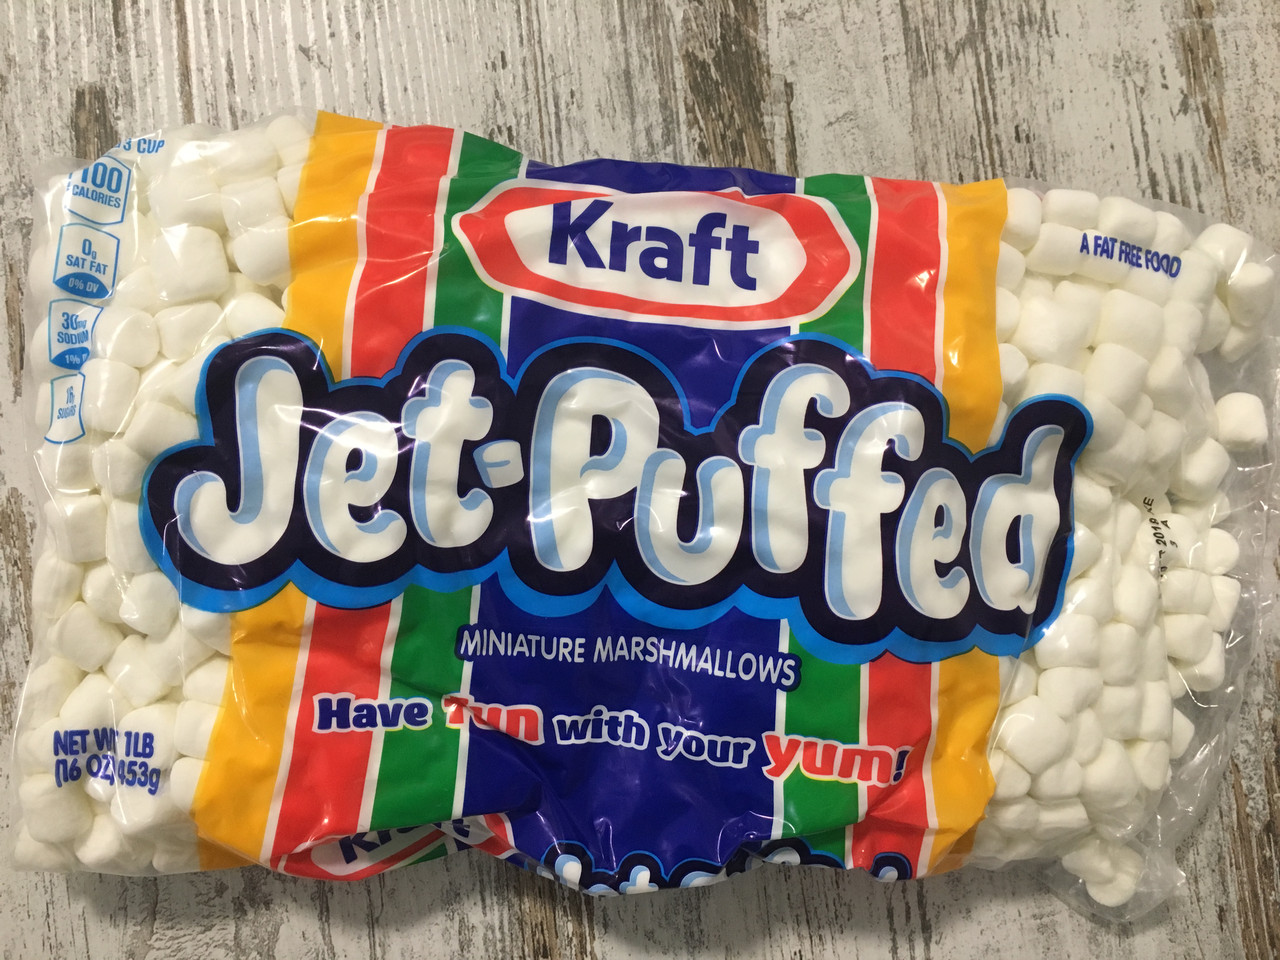 Marshmallow маршмэллоу конфеты-зефиринки в ваш любимый кофе, 454 грамма